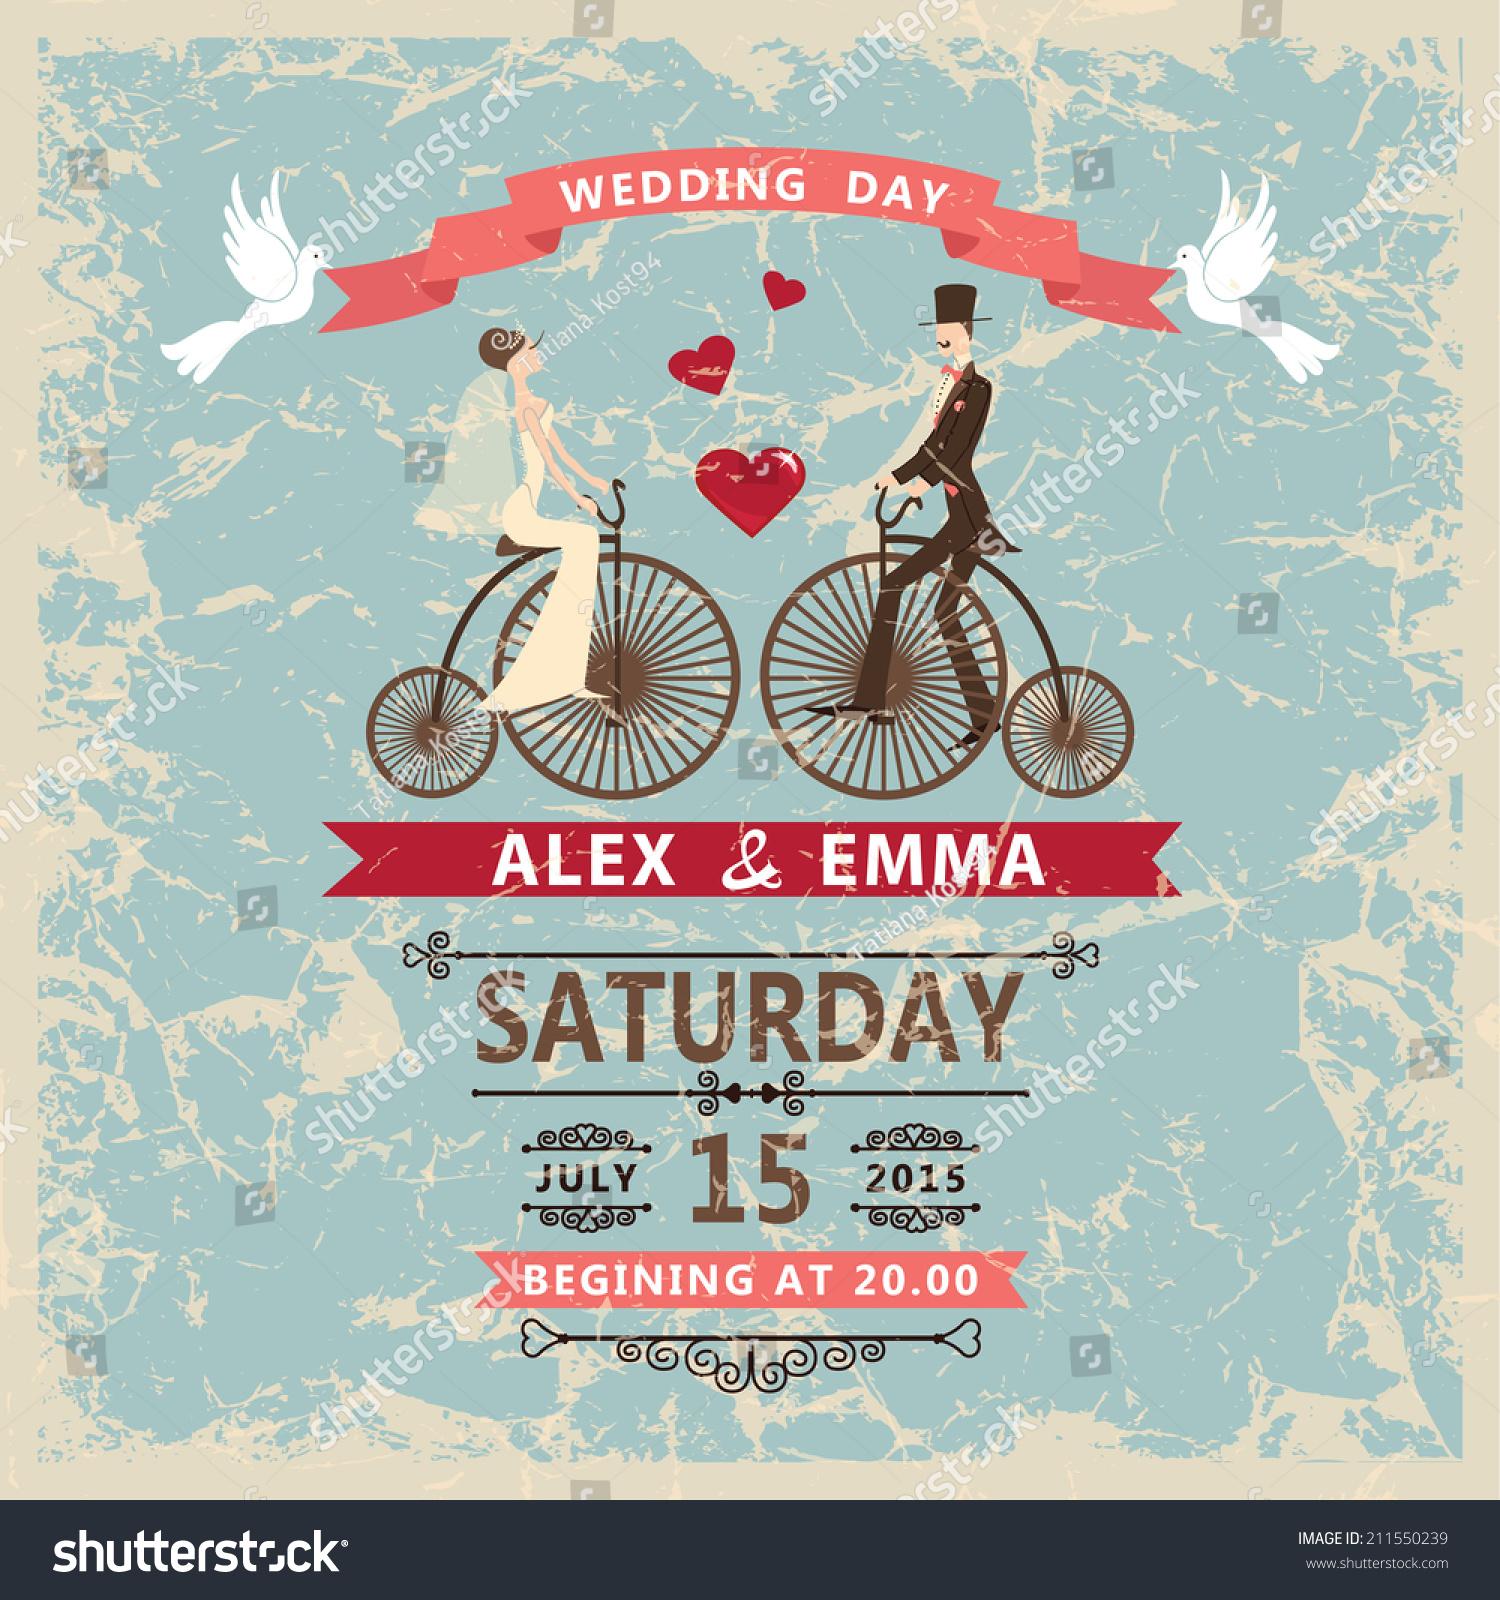 Retro Wedding Invitation Cute Cartoon Couple Groom Stock Vector ...